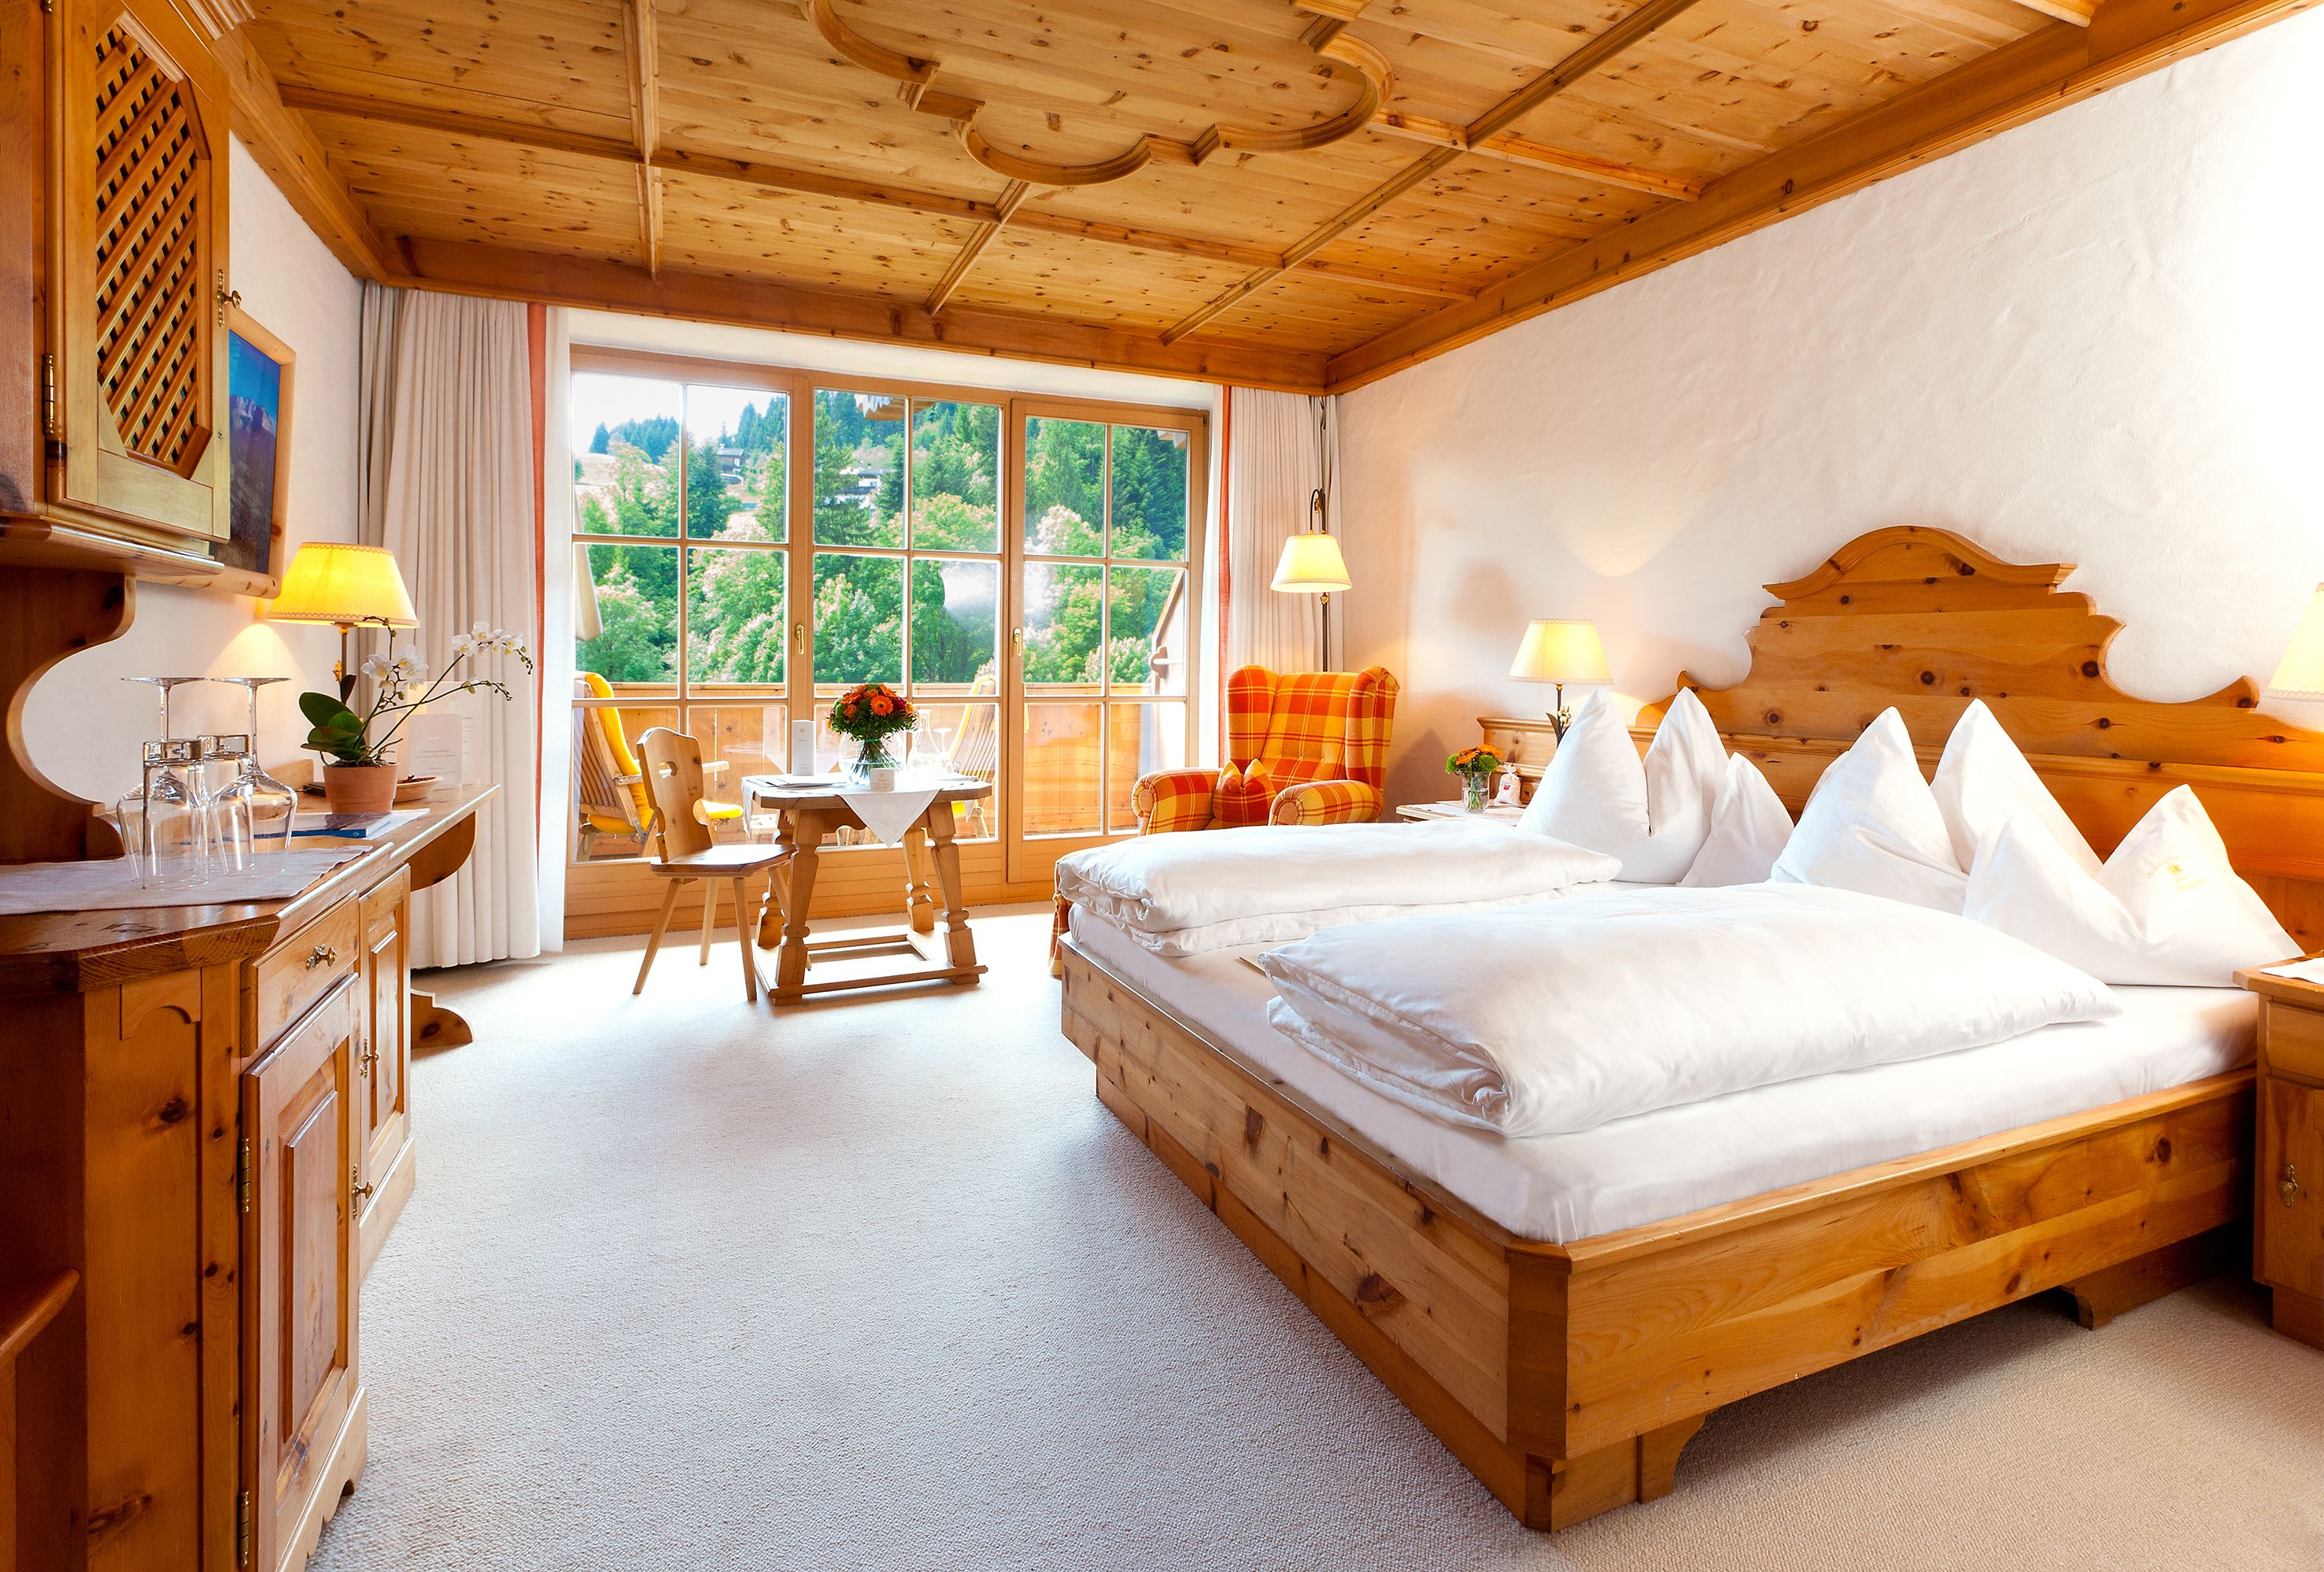 zimmer suiten zimmer suiten via biohotel stanglwirt hotels. Black Bedroom Furniture Sets. Home Design Ideas